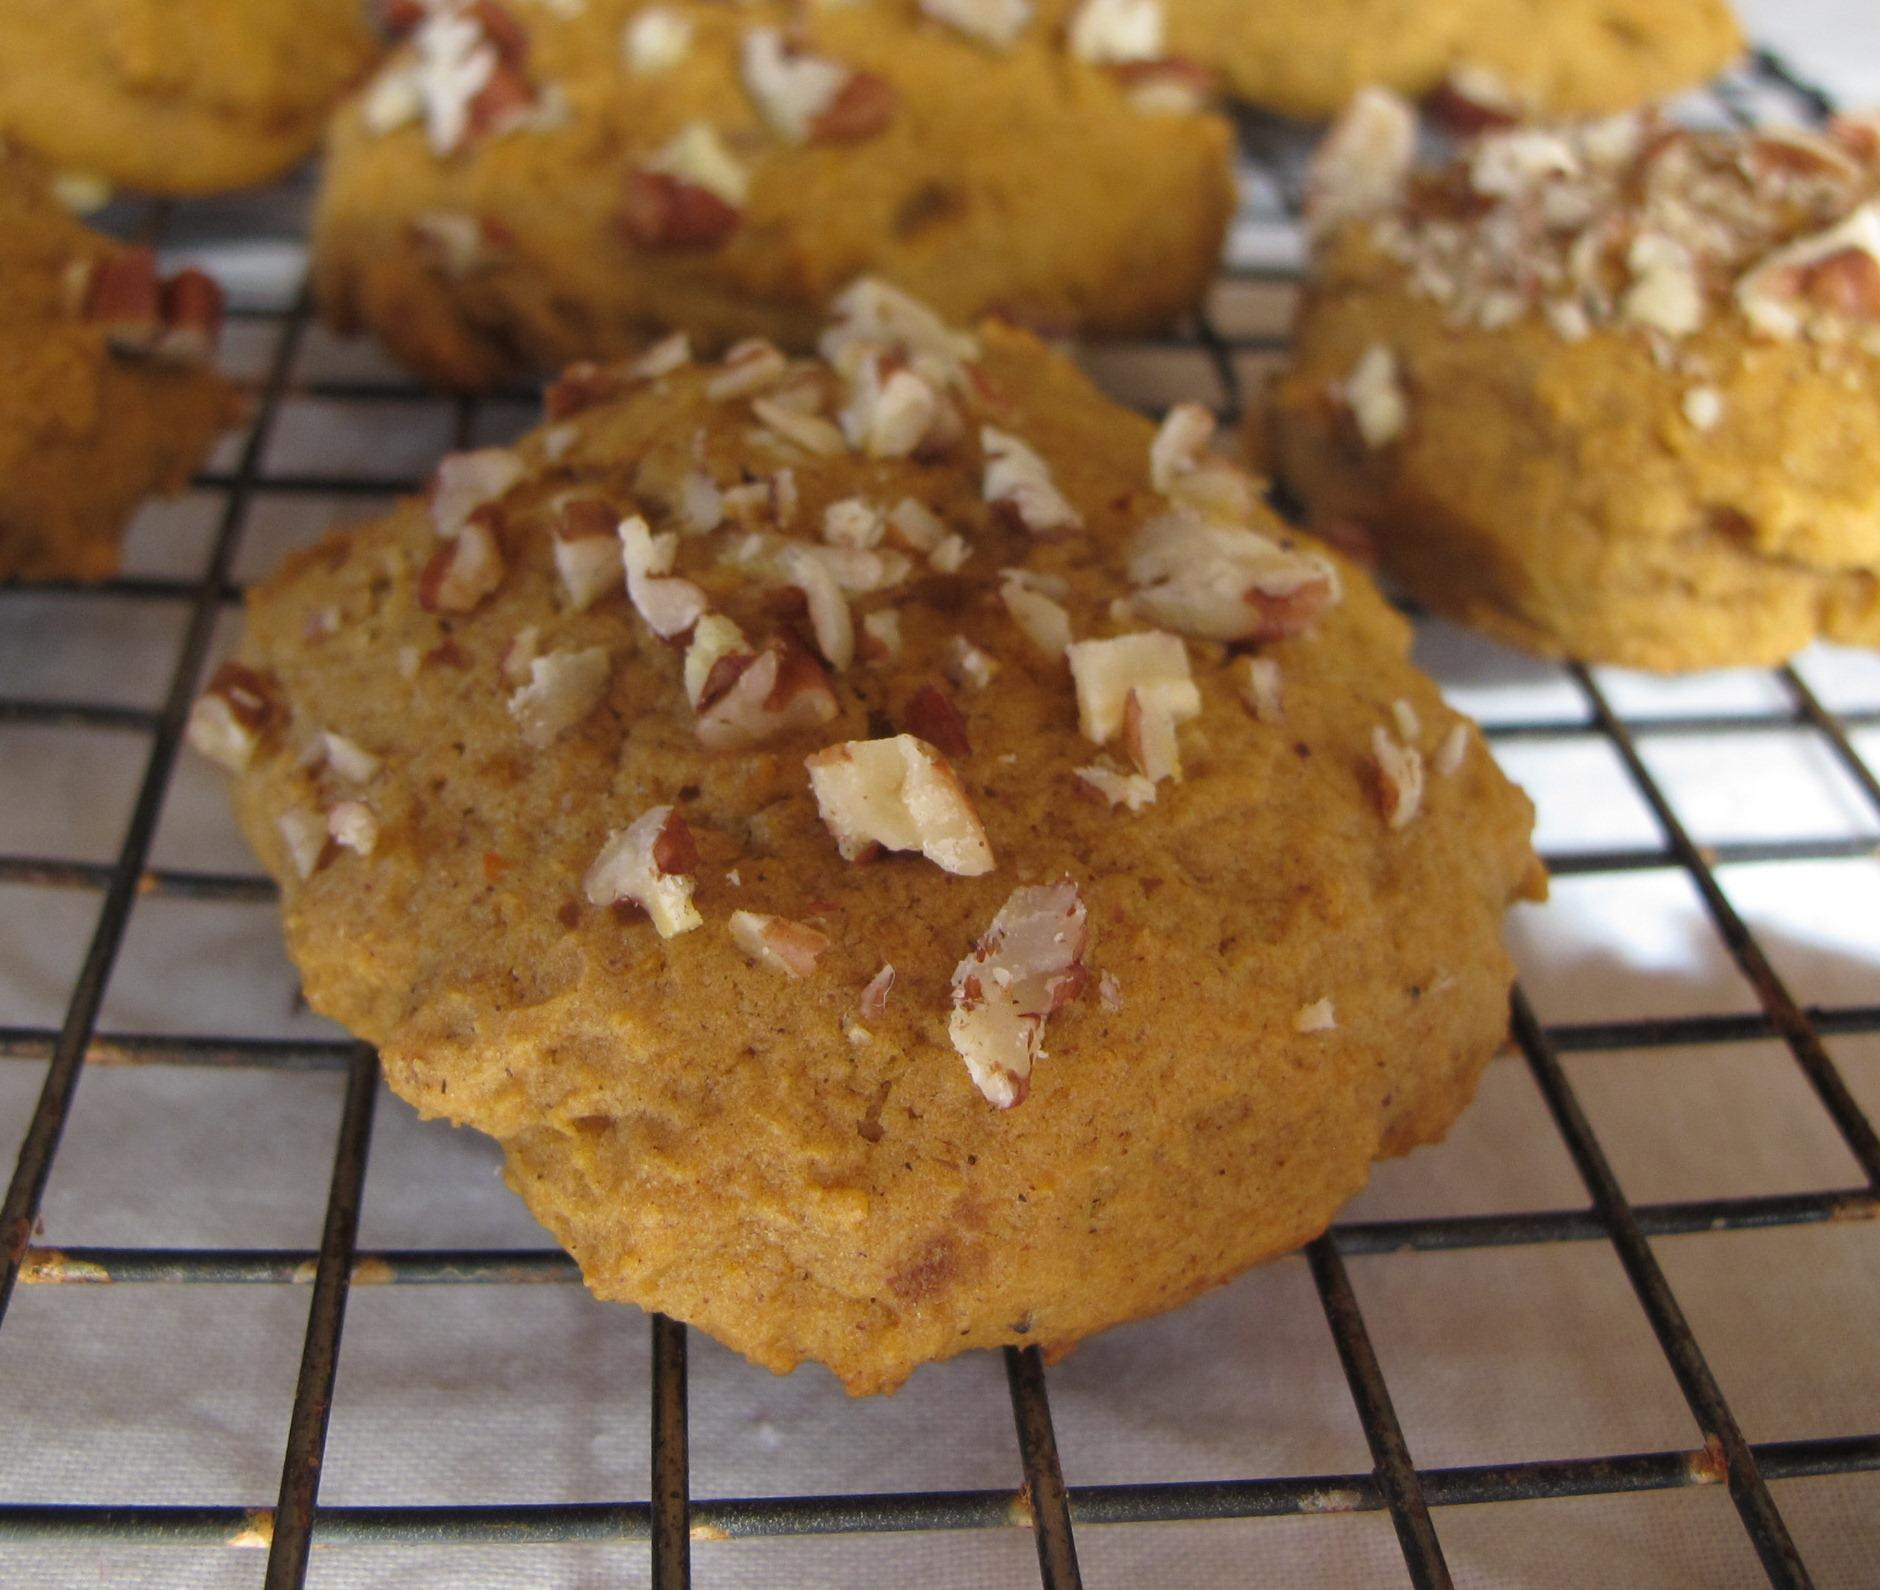 Pumpkin-Brown Butter Top of Chai Spice Whoopie Pie